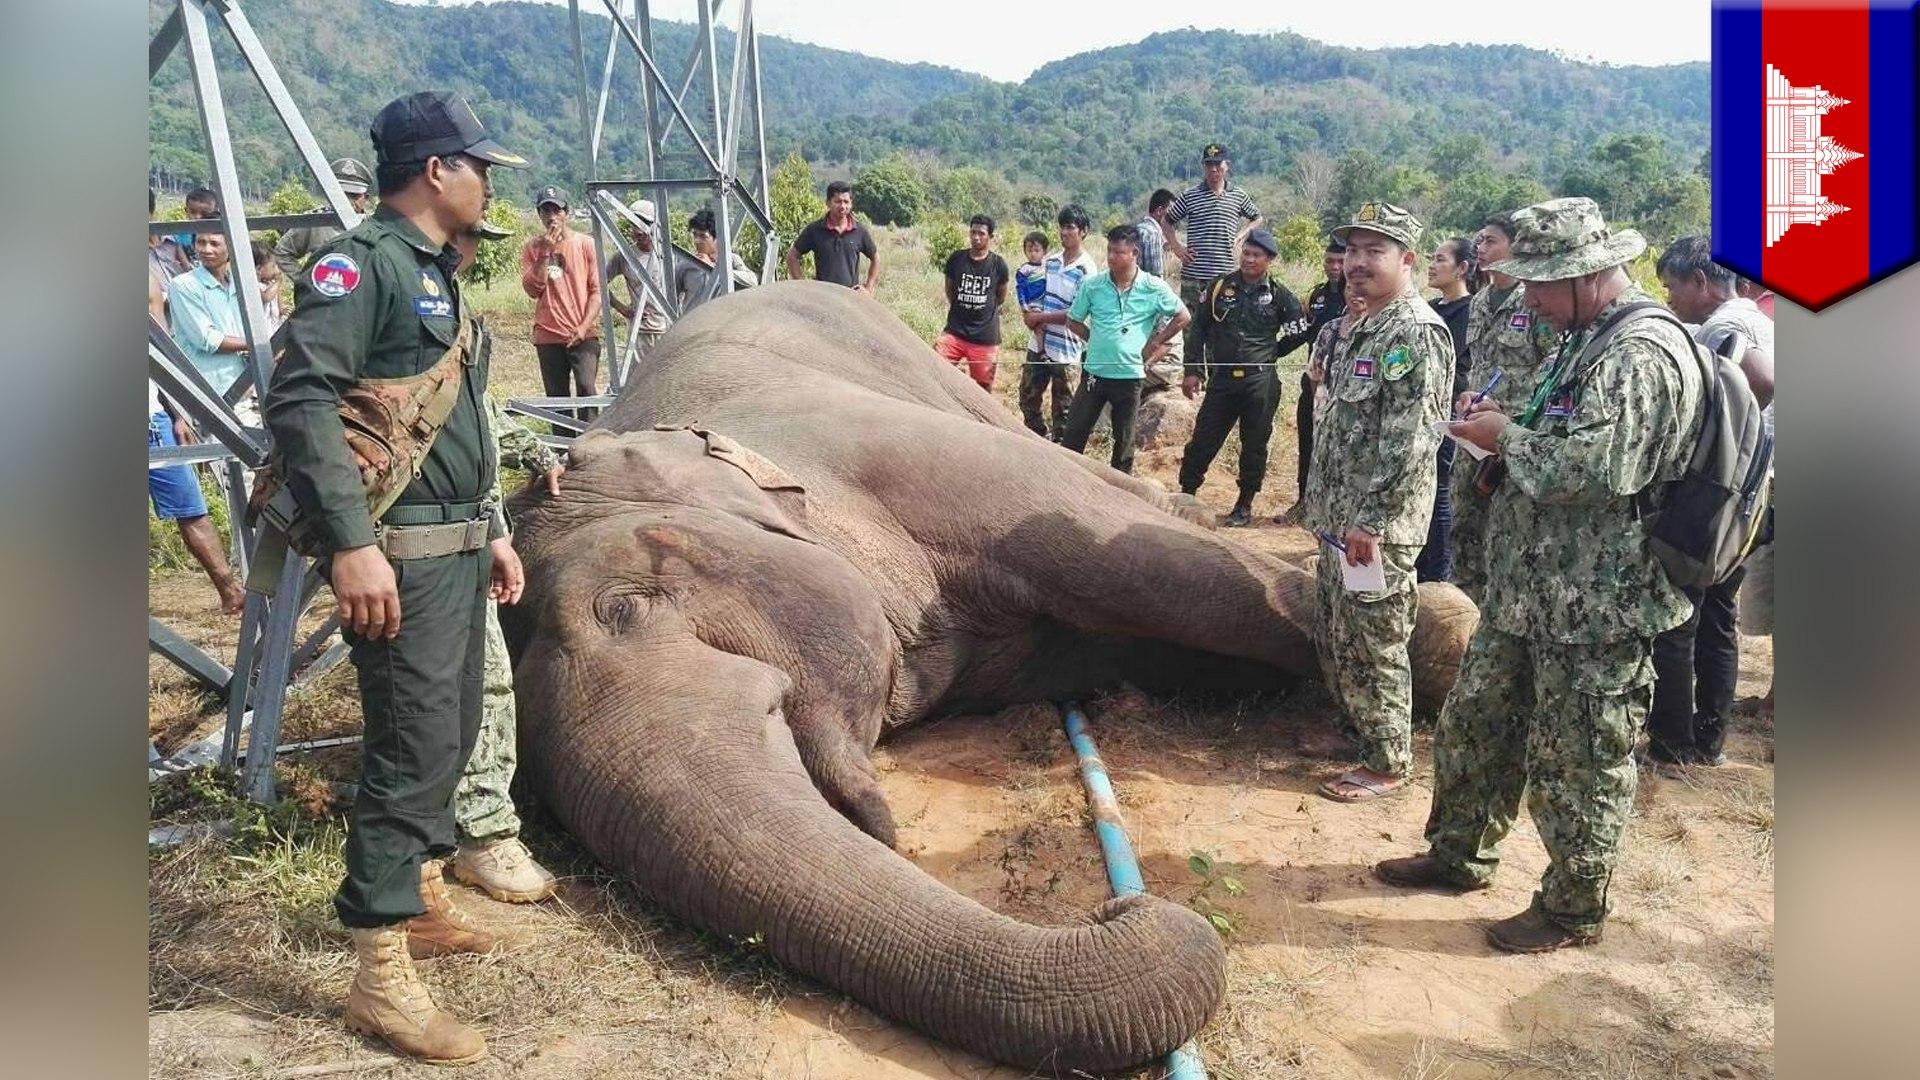 Gajah Asia langka mati tersengat menara listrik - Tomonews